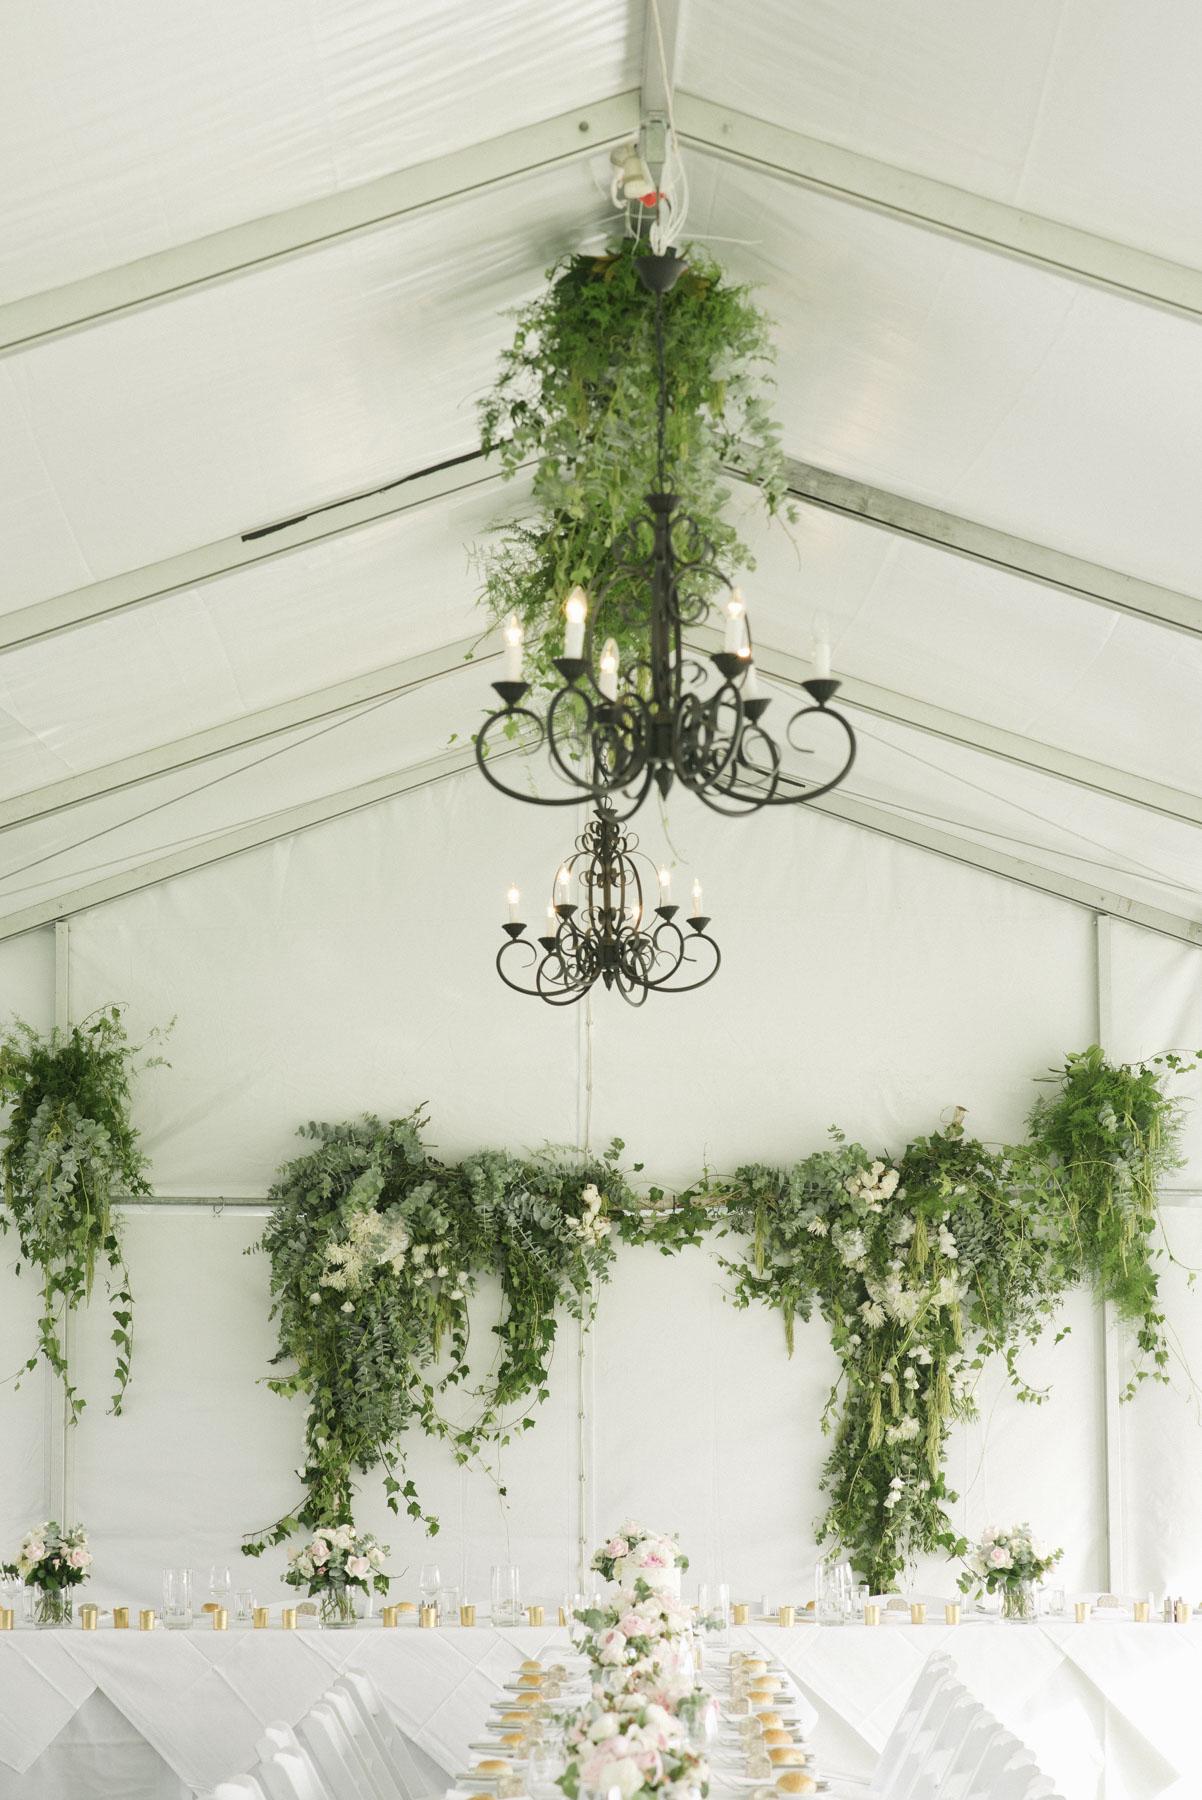 1501vand-273alan_moyle_wedding_portrait_brighton_bayside_werribee_estate_mansion_zoo_rustic_styled_garden_mansion_candid_documentry_victoria_whitelaw.jpg